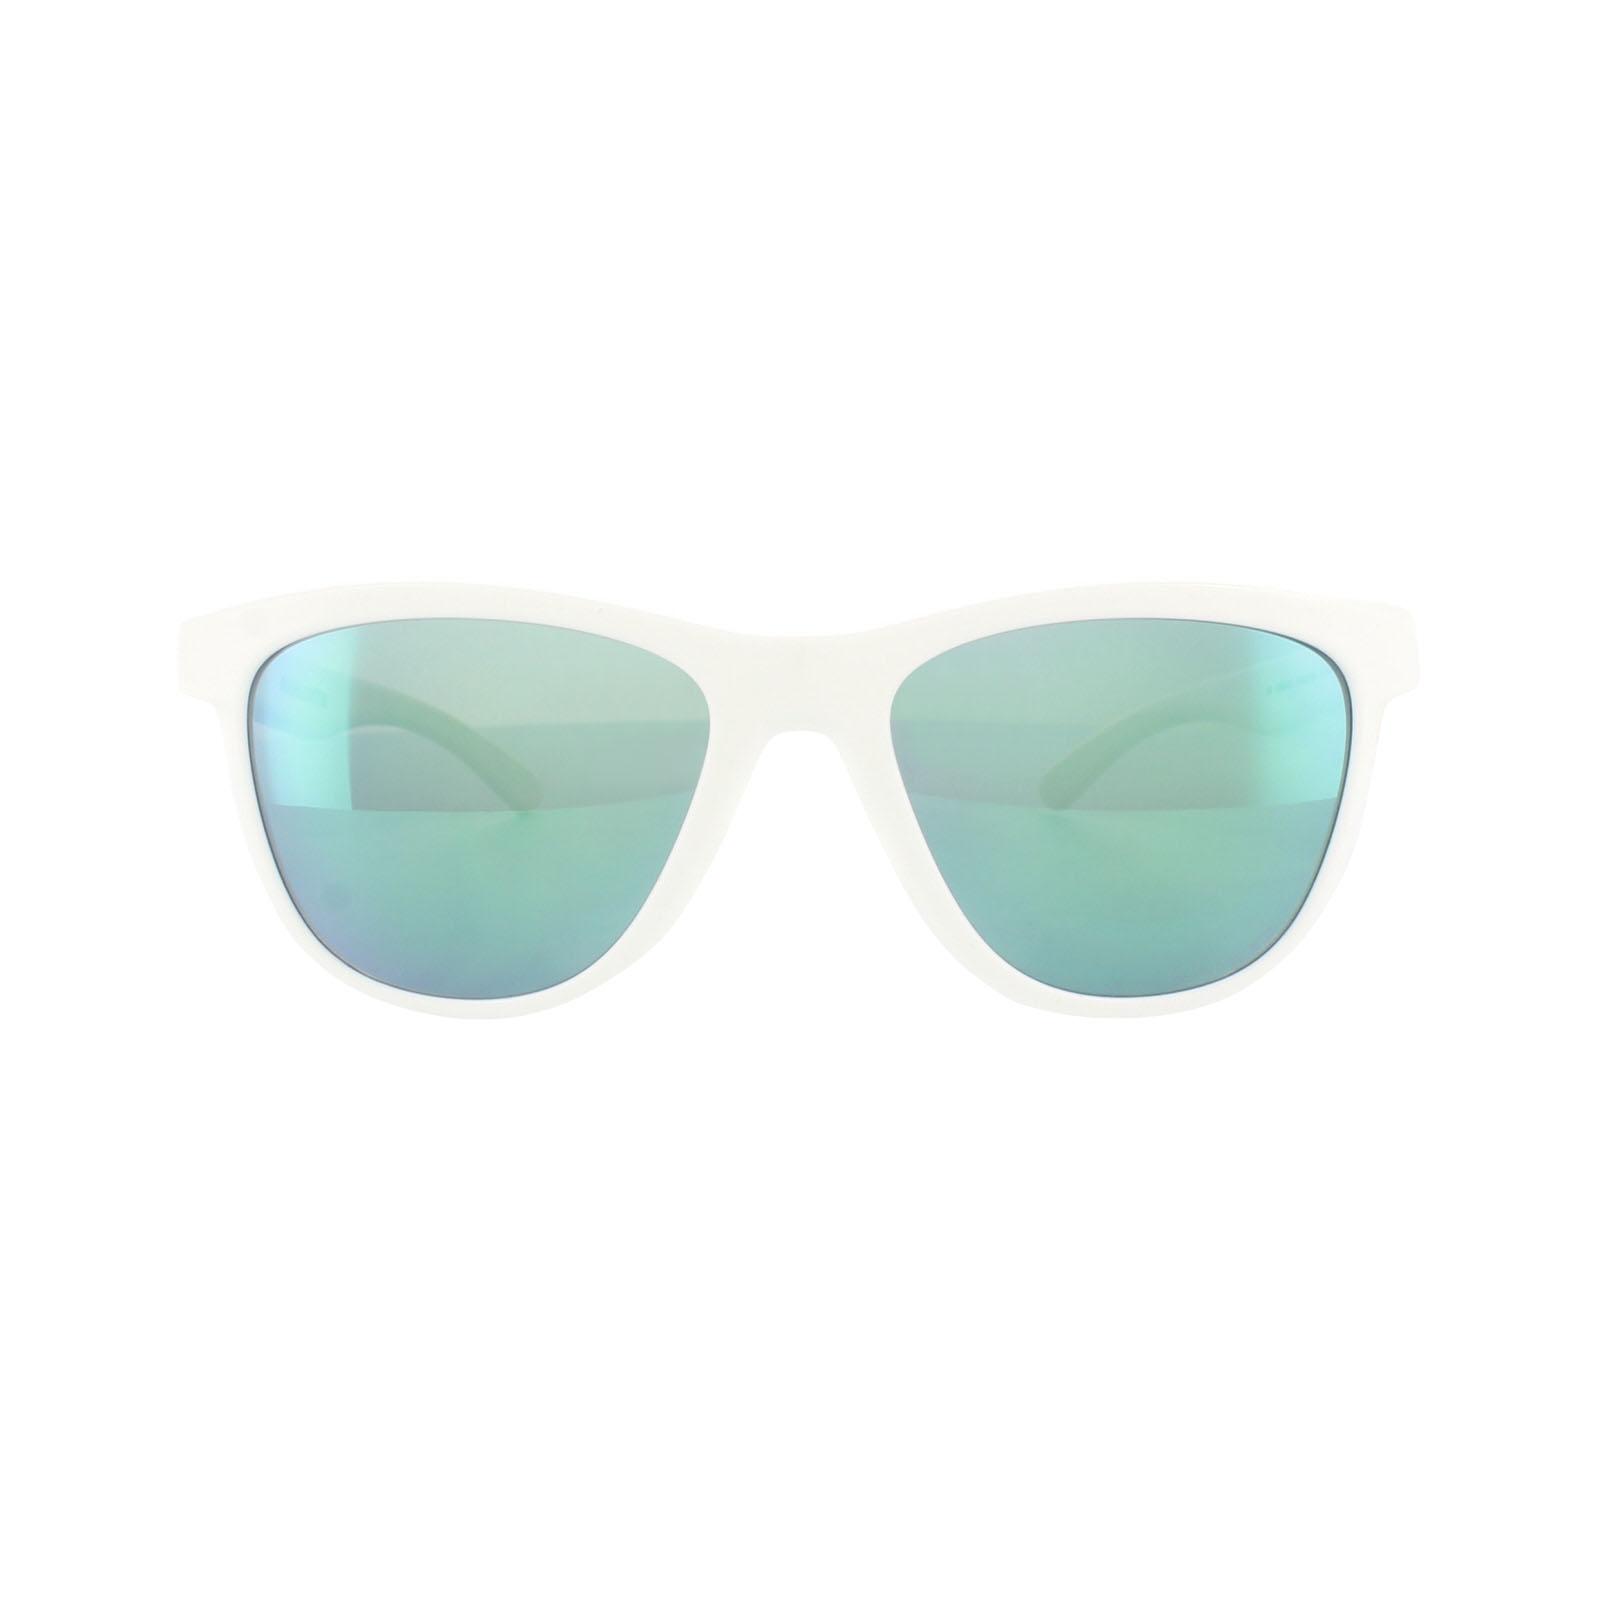 c6a3f341719 Sentinel Oakley Sunglasses Moonlighter OO9320-06 Polished White Jade  Iridium Polarized